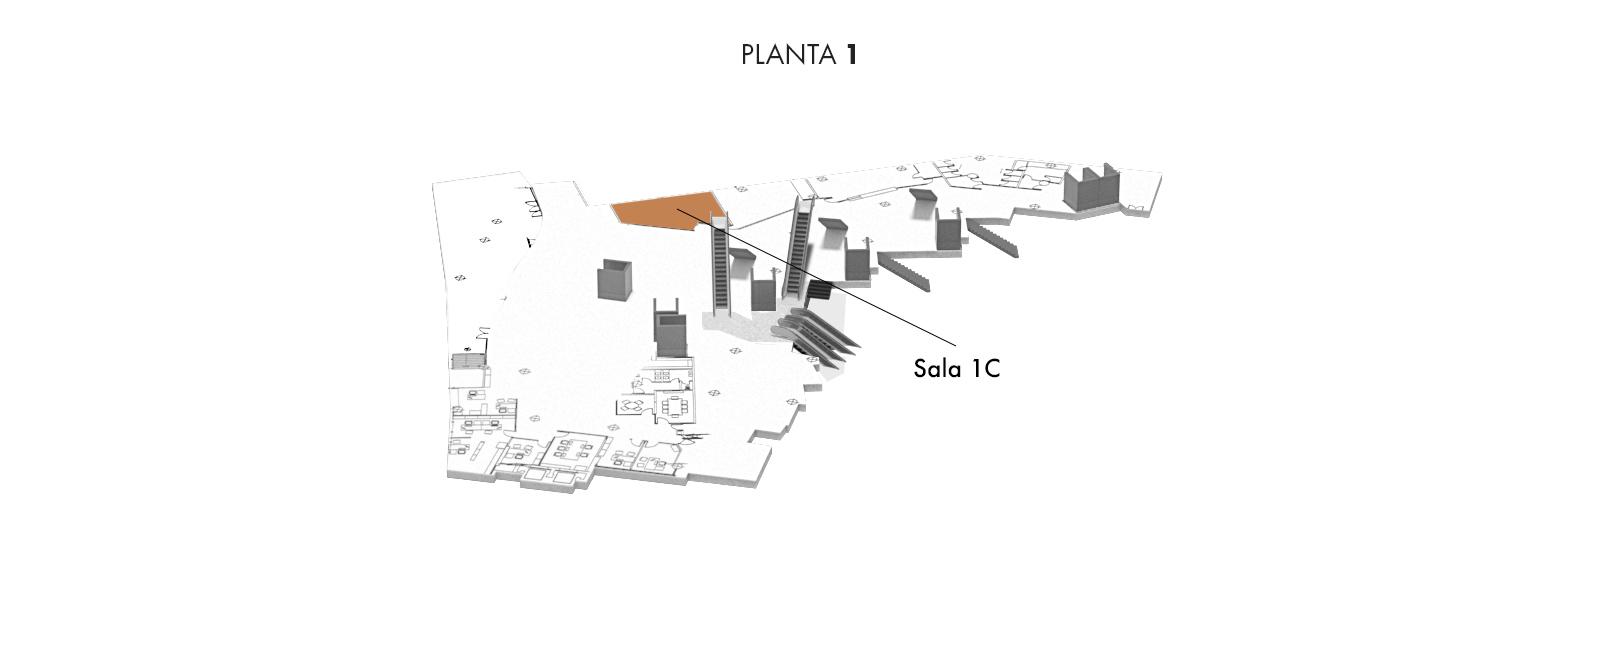 Sala 1C, Planta 1   Palacio Euskalduna Jauregia